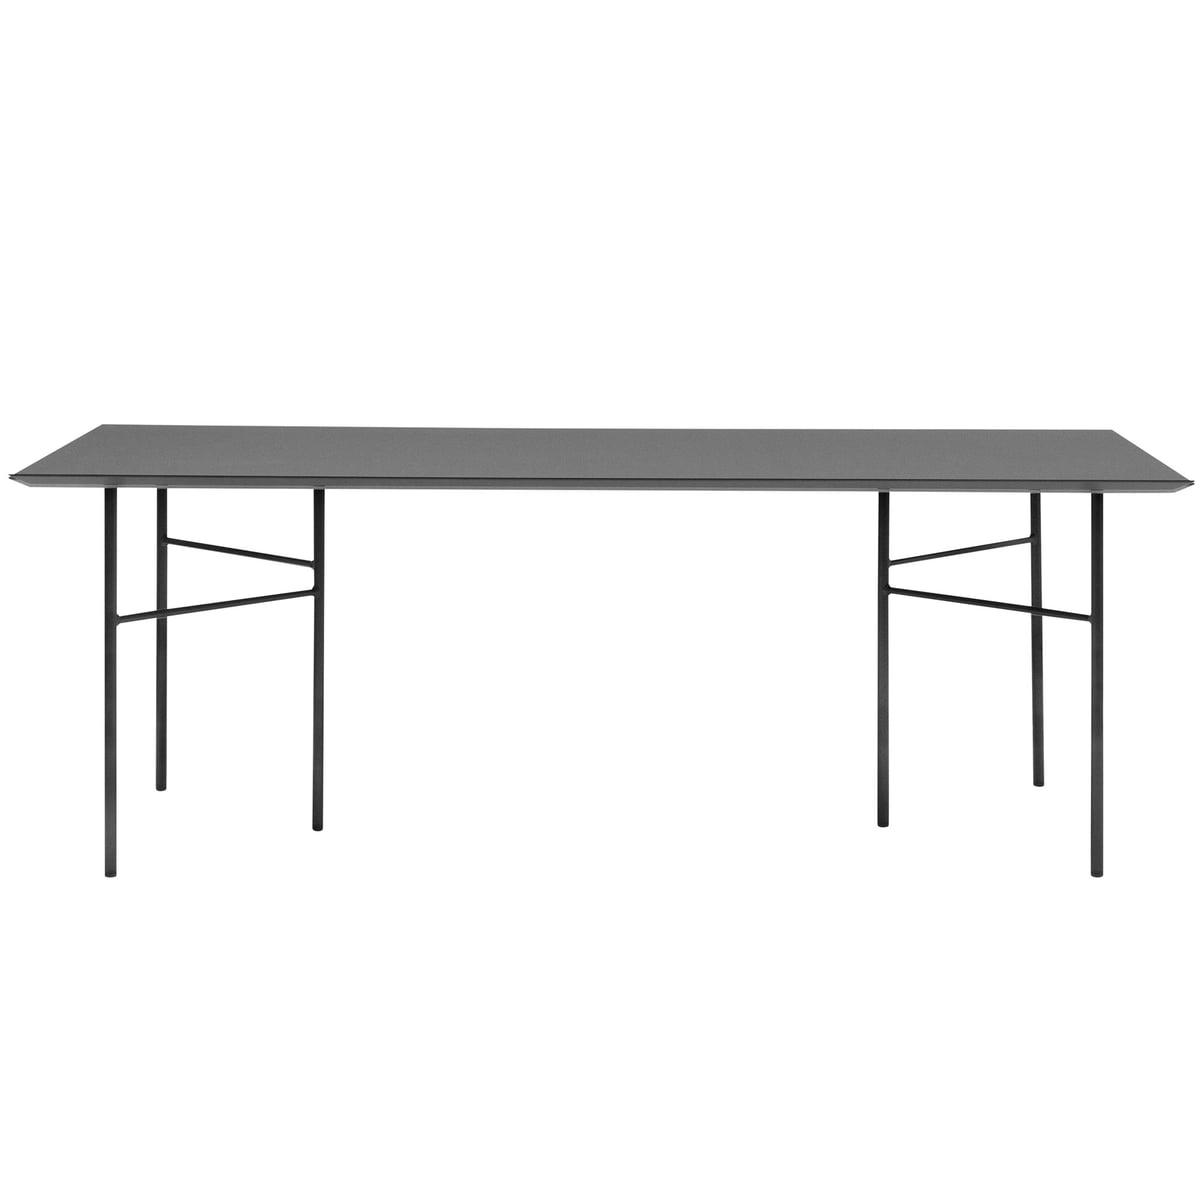 ferm living bord Mingle bordplade med linoleum fra ferm Living ferm living bord